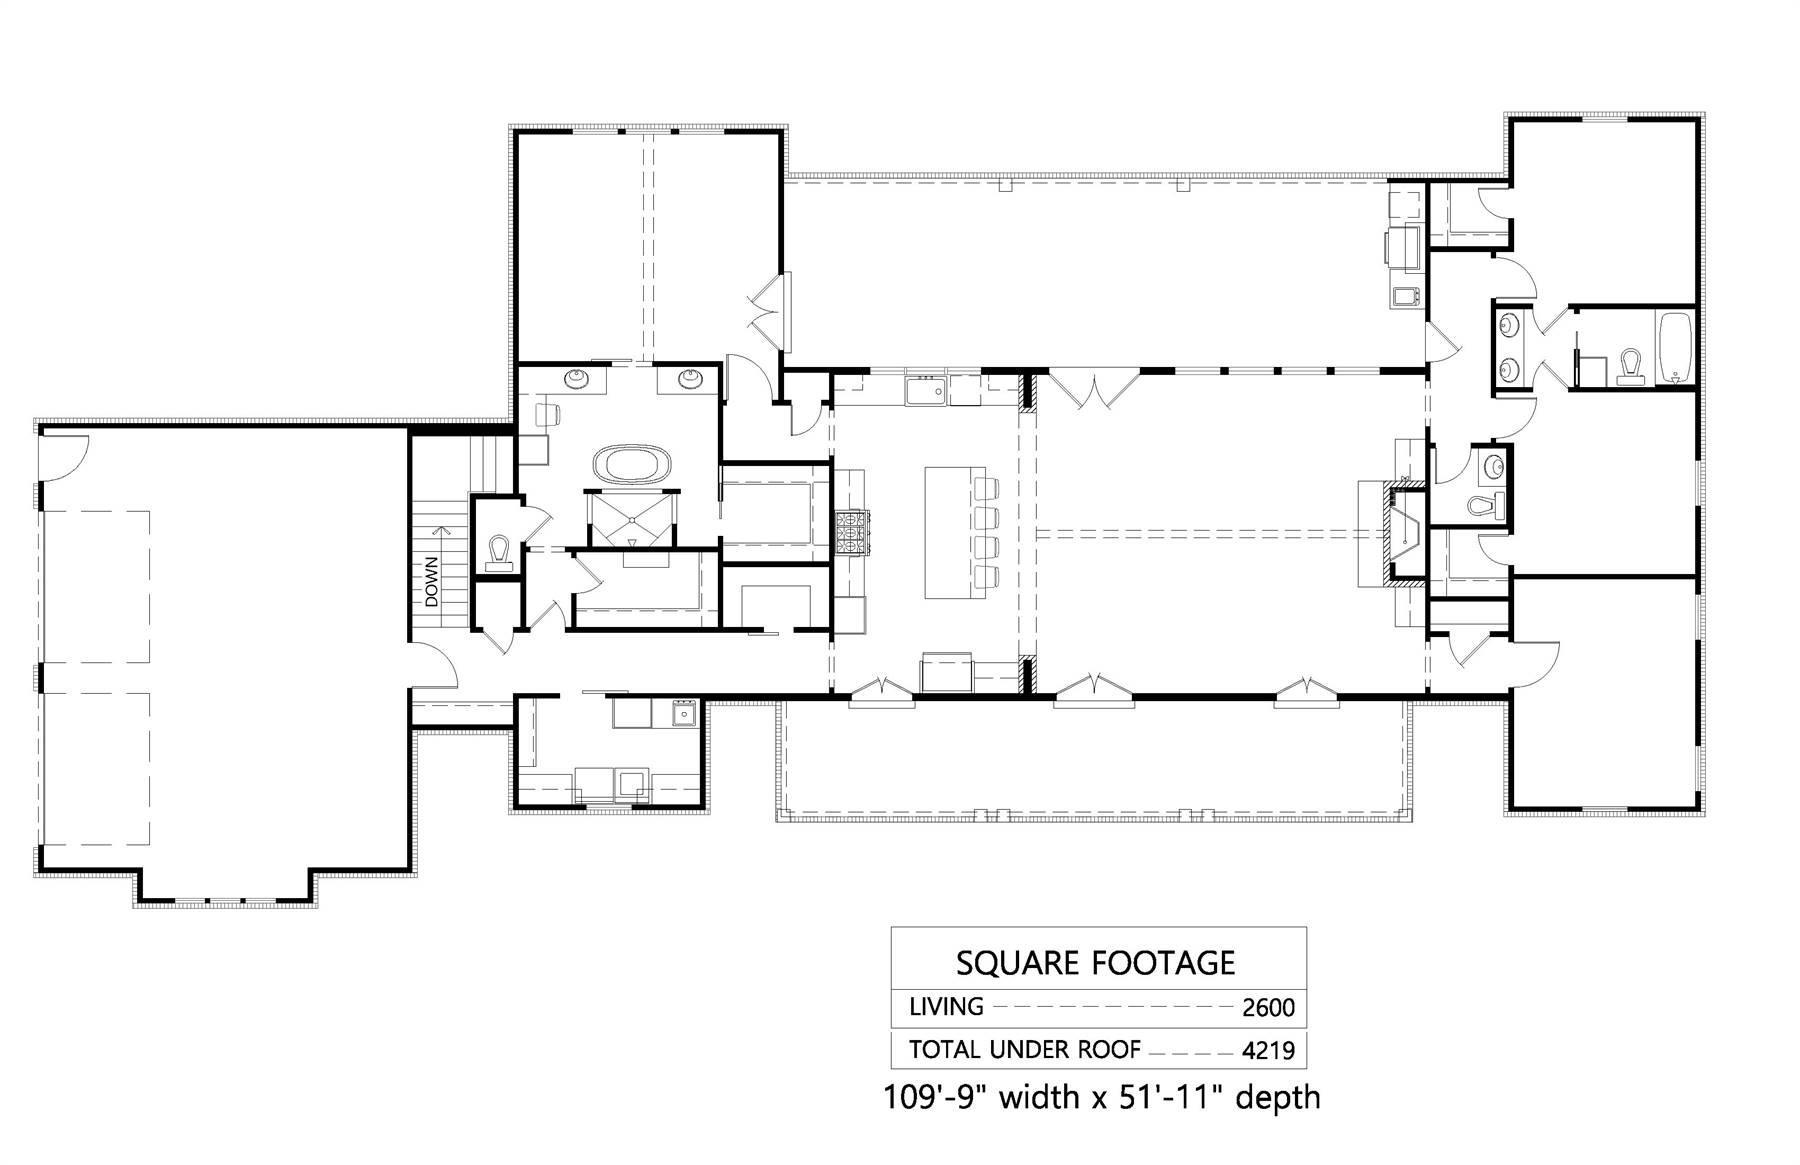 Basement Option Floor Plan